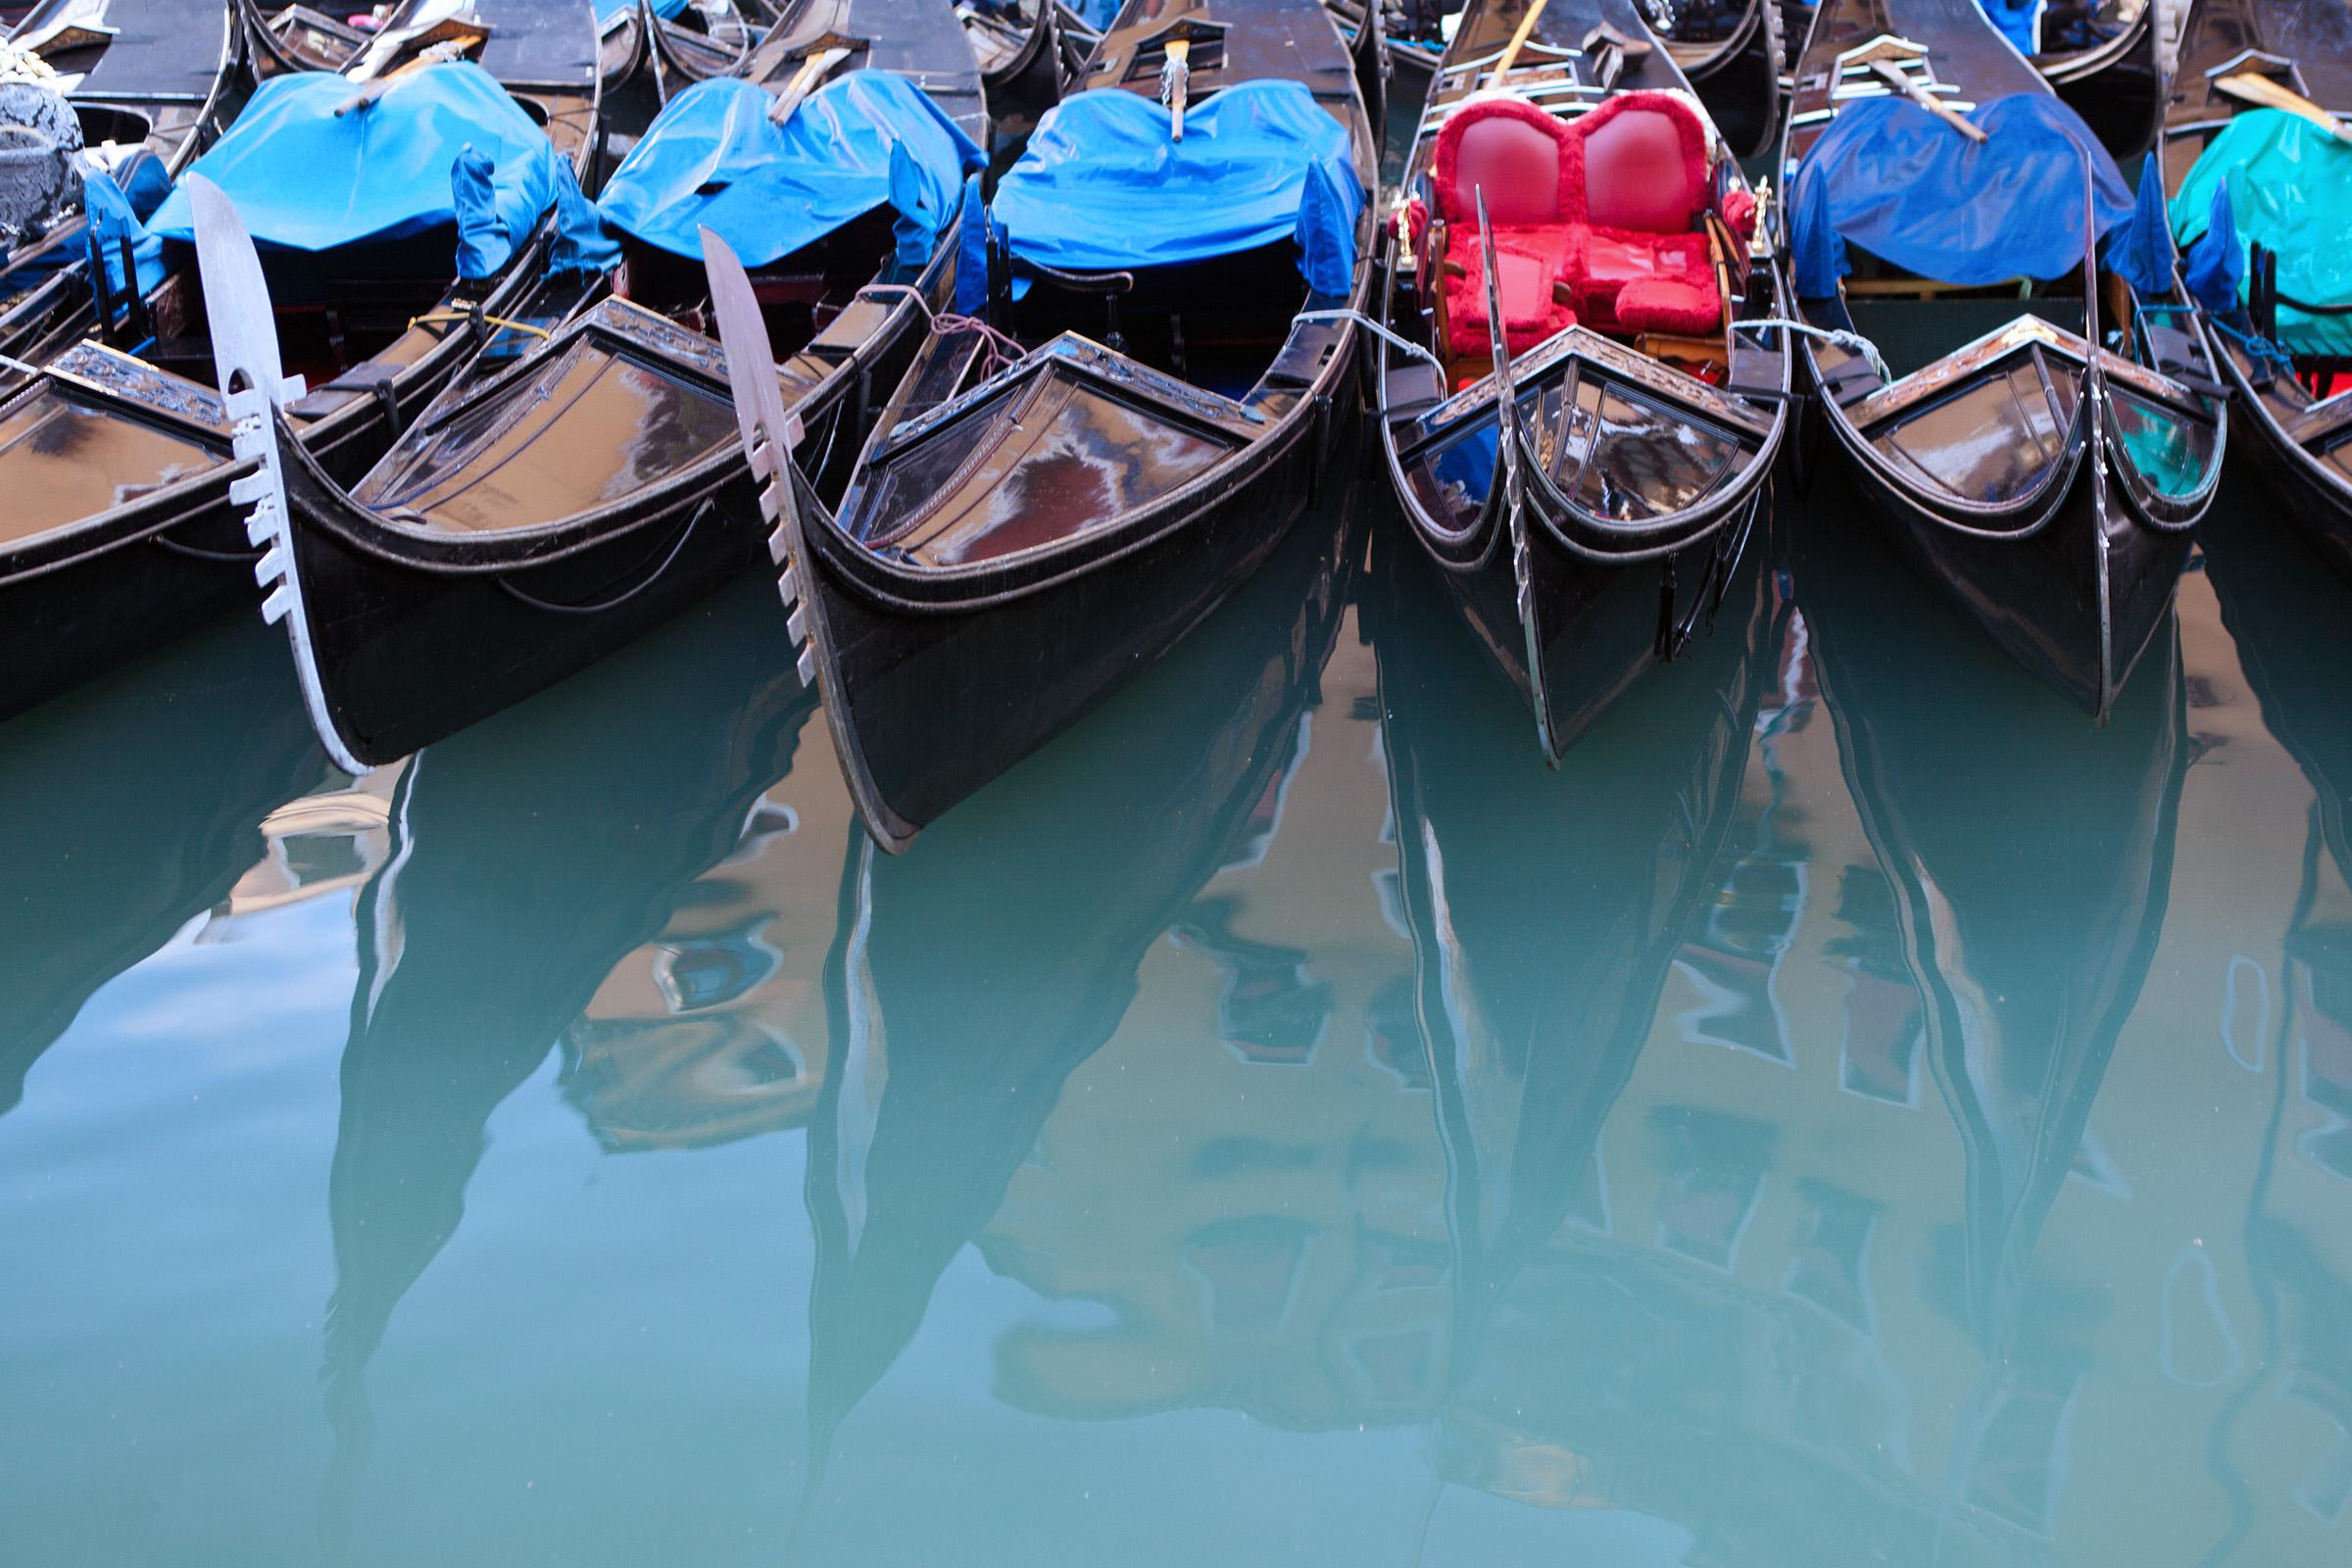 Gondola, Adriatic, Tourism, Landmark, Light, HQ Photo